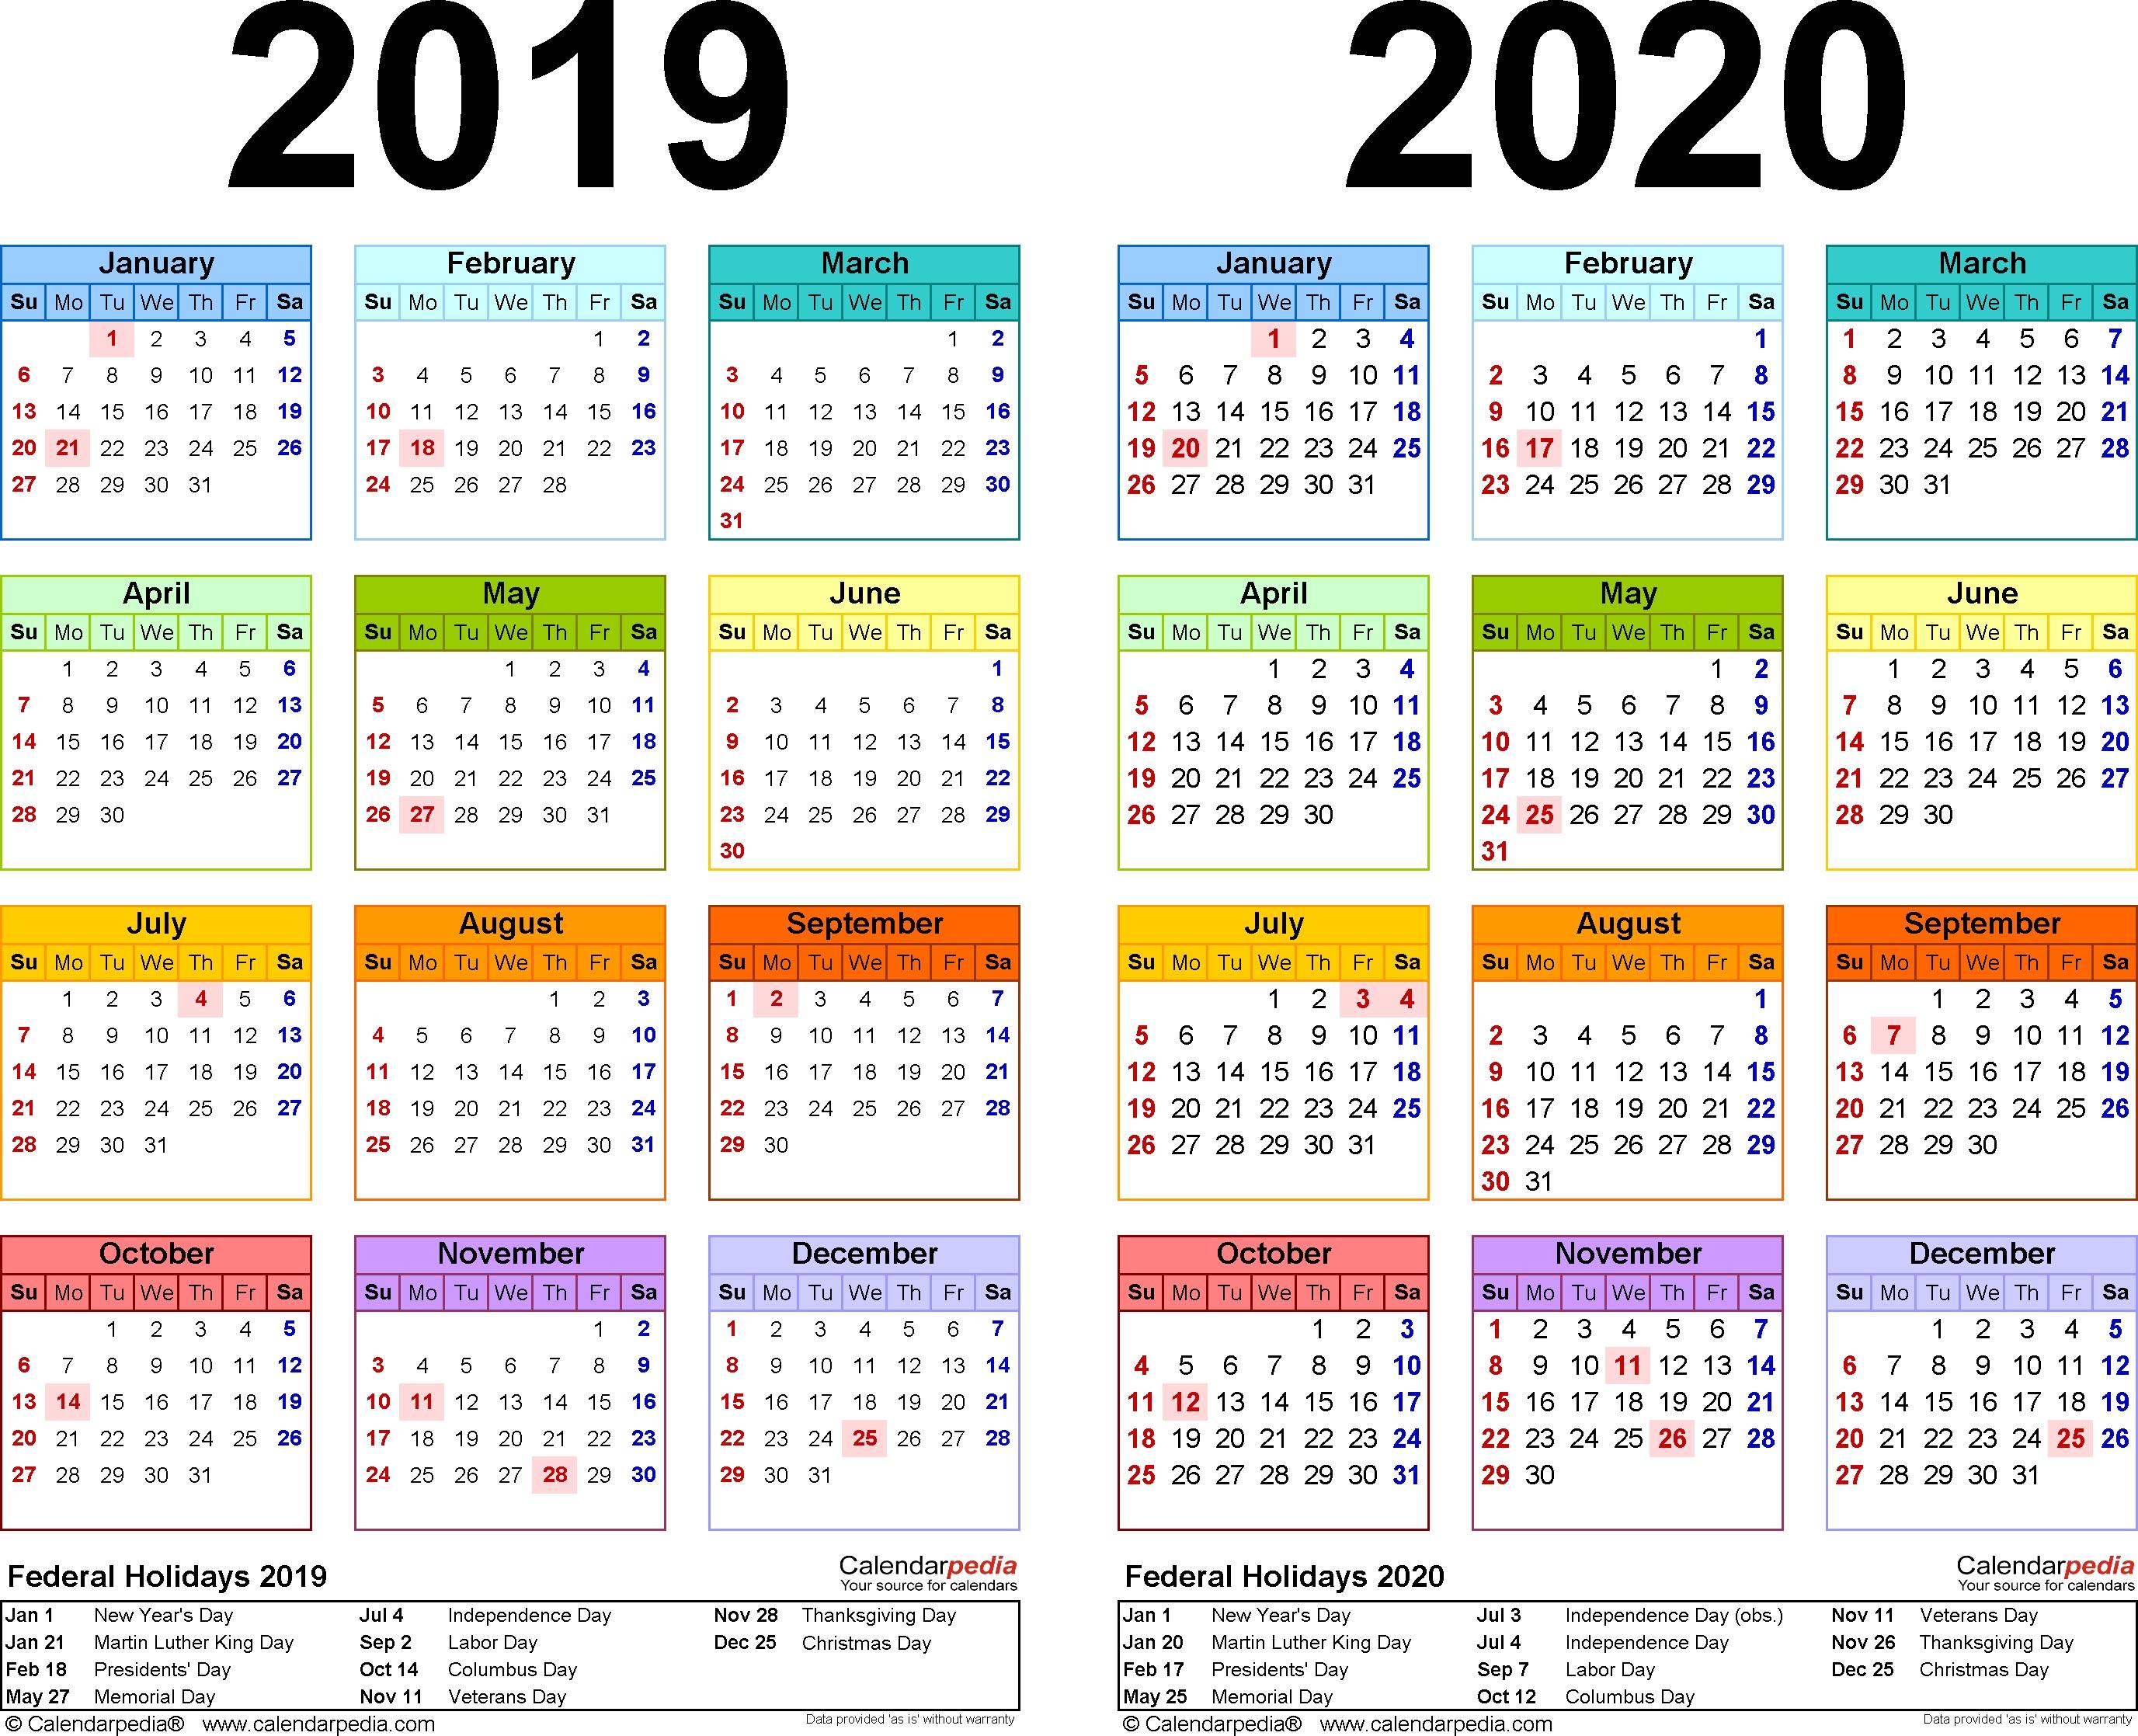 2019-2020 Calendar - Free Printable Two-Year Word Calendars regarding Fillable 2019-2020 Calendar